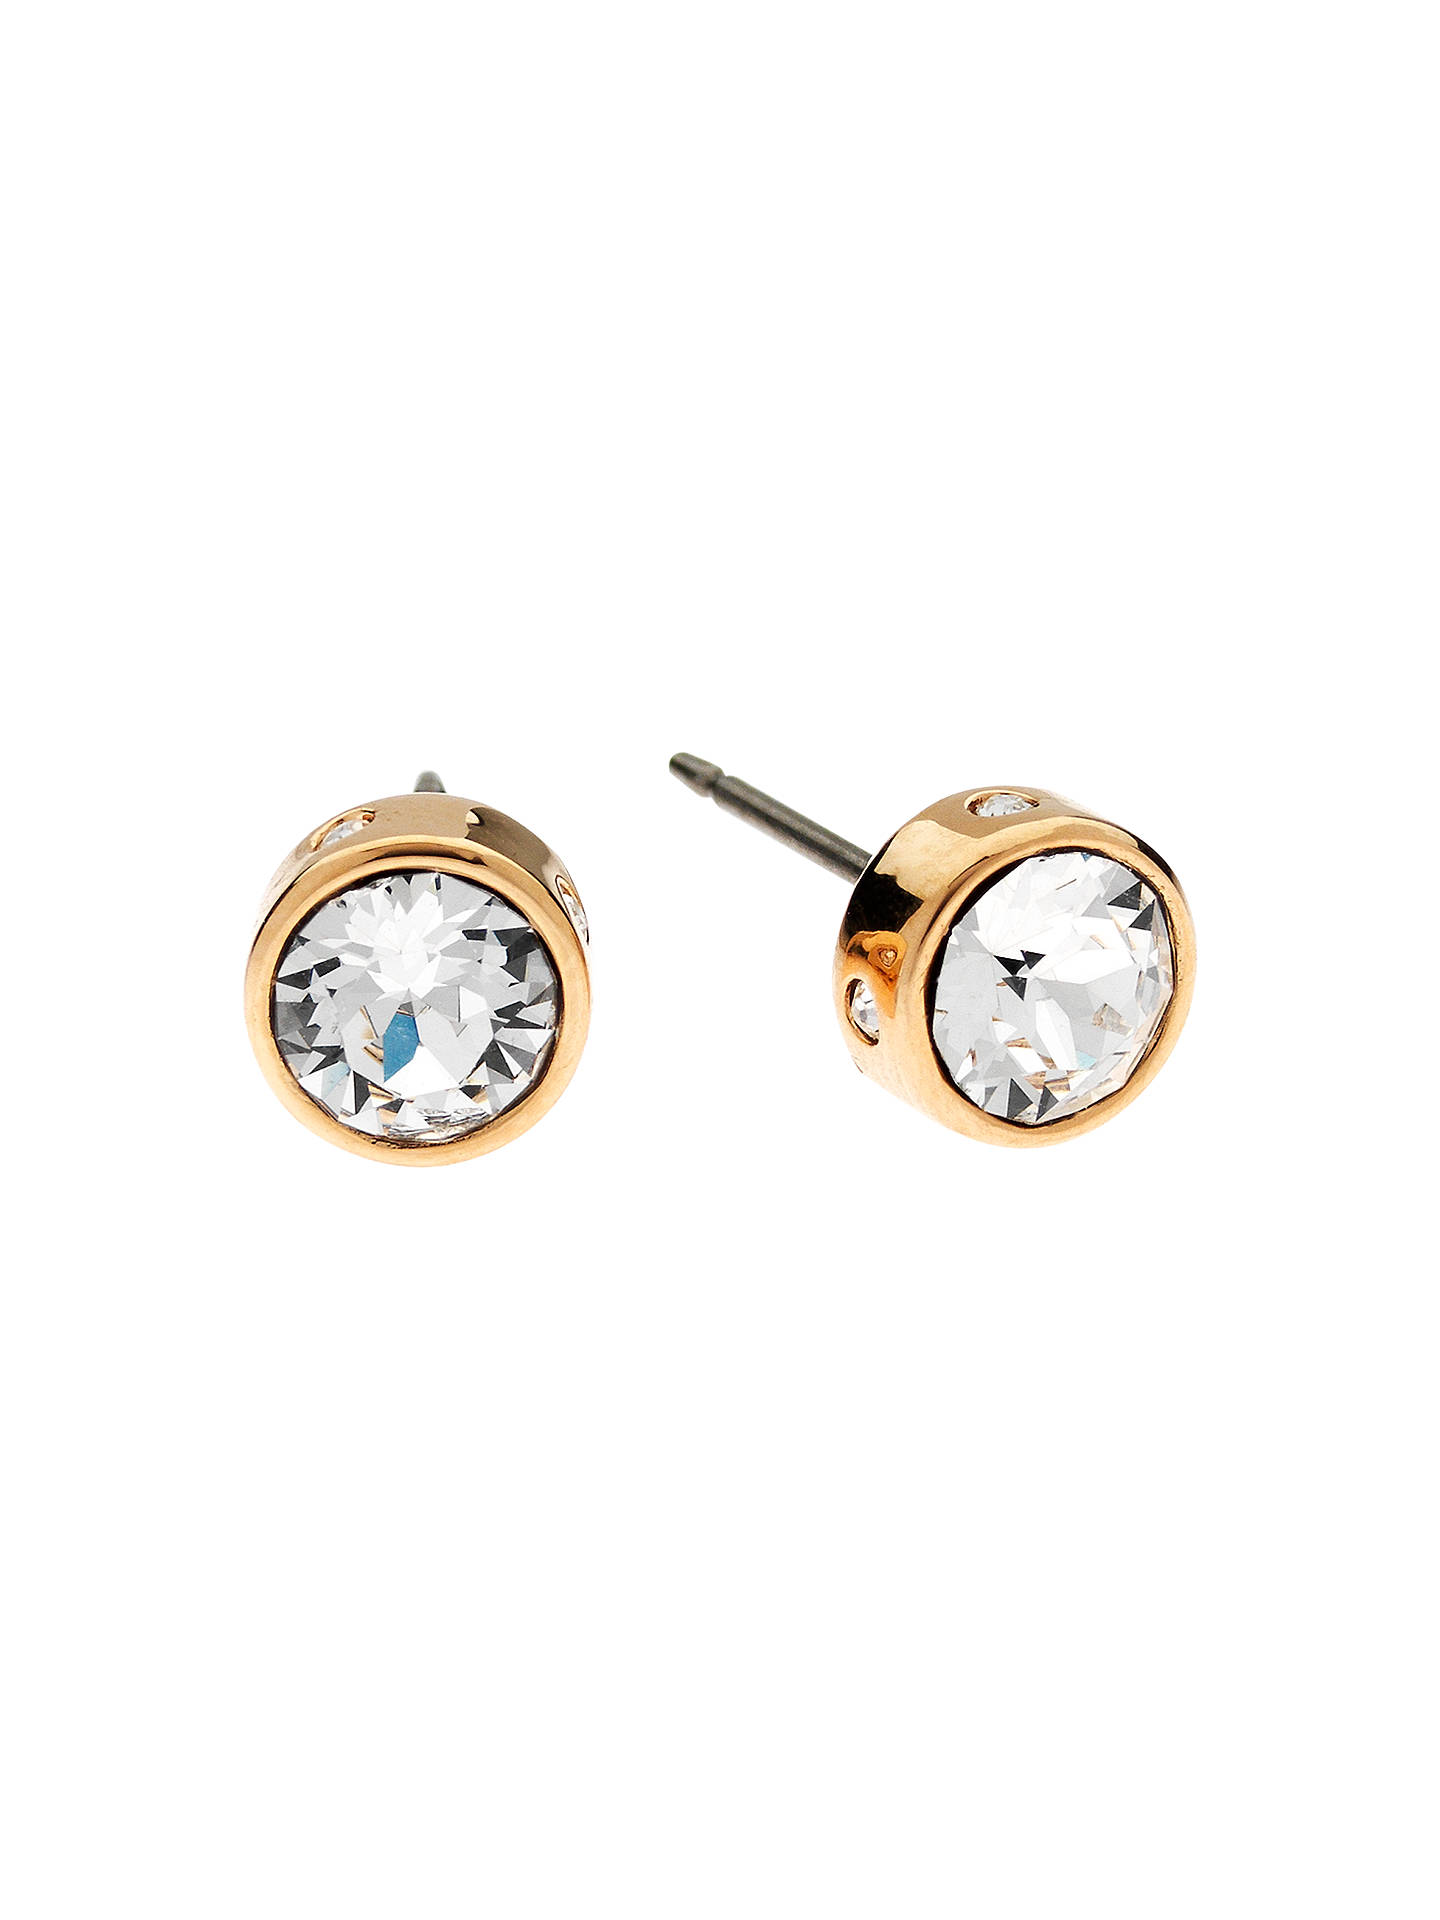 d6718b8f4 Buy Cachet Rose Gold Plated Bezel Set Swarovski Crystal Stud Earrings  Online at johnlewis.com